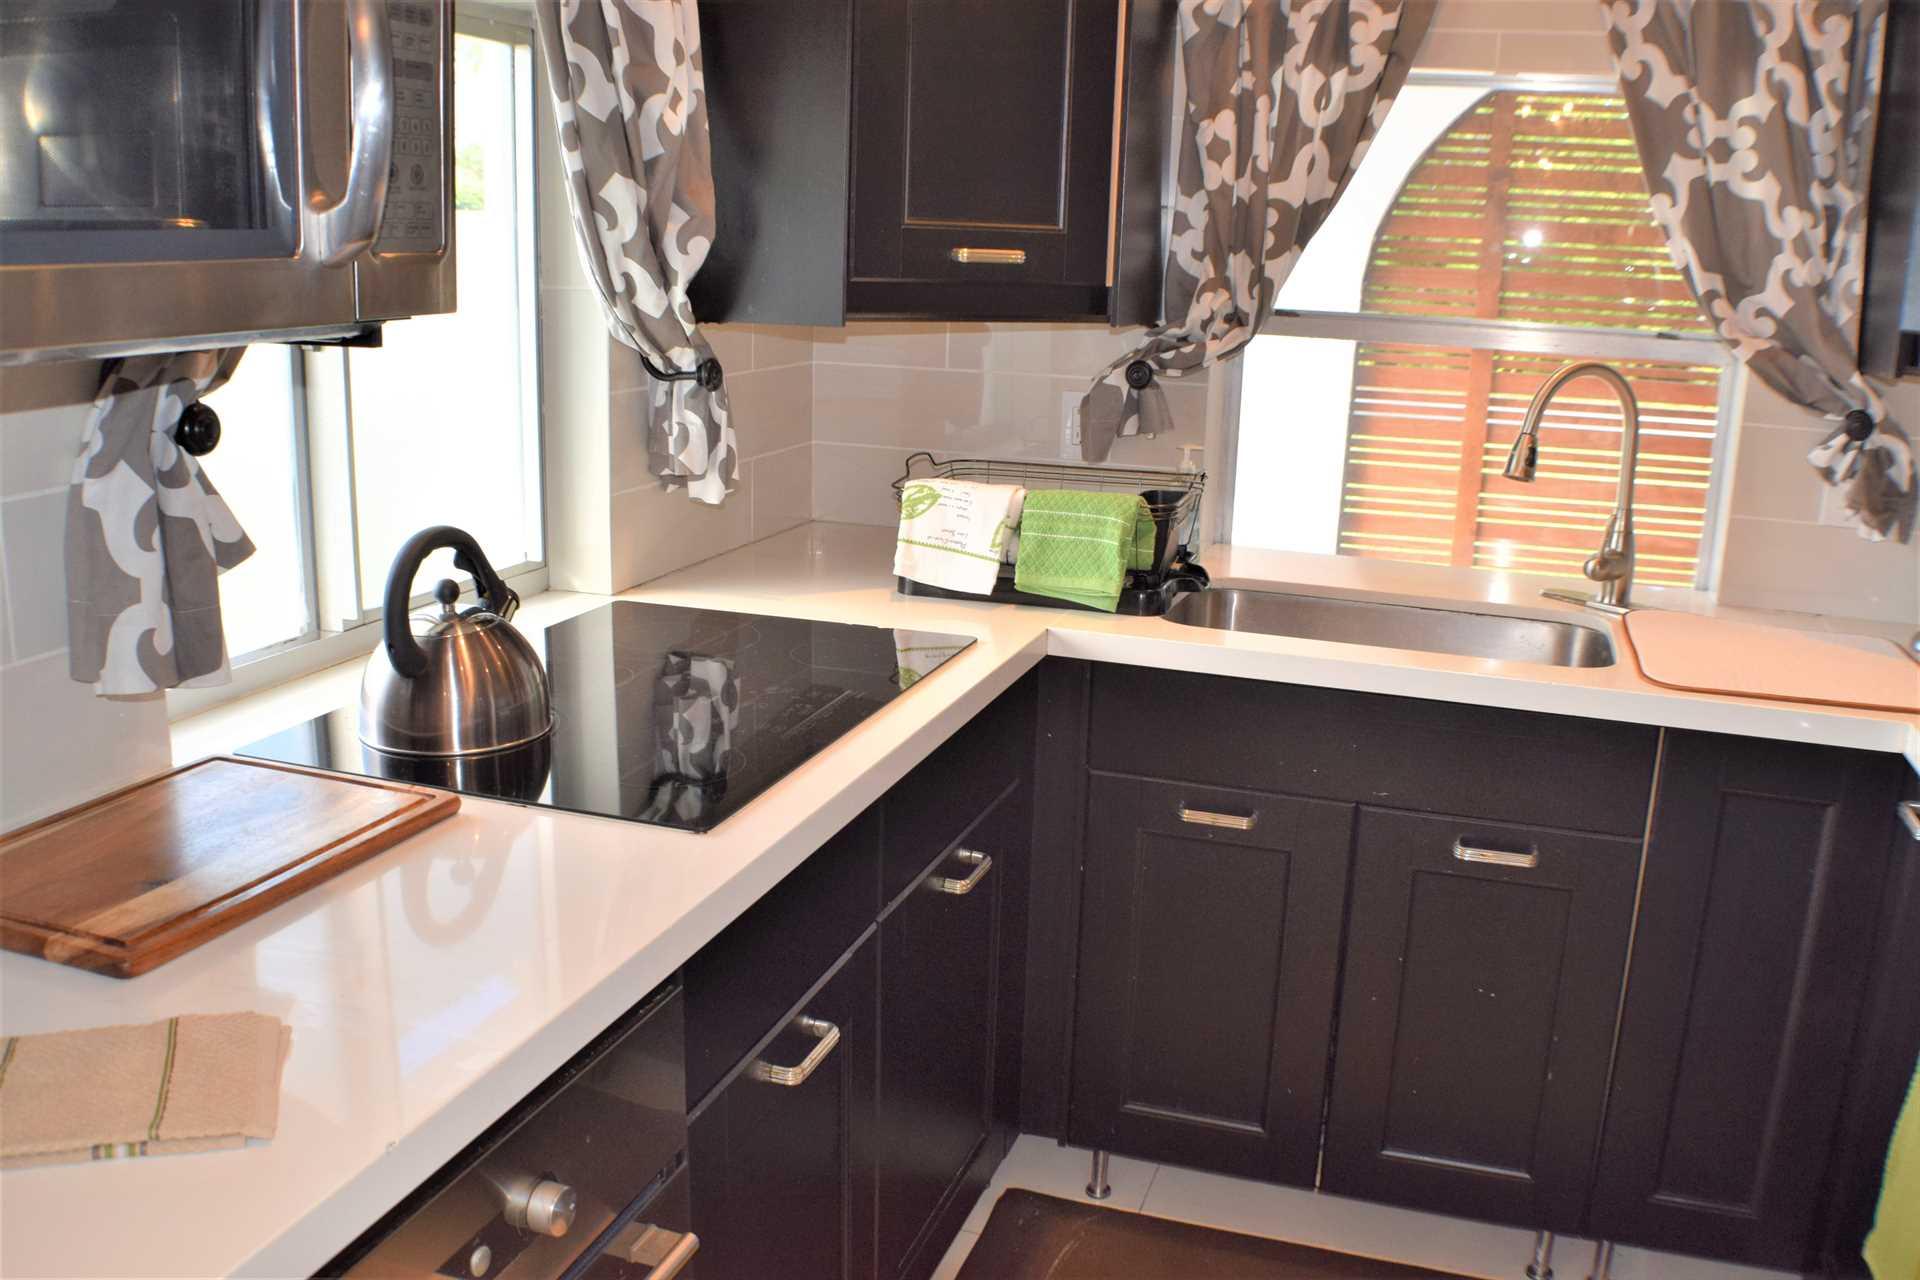 Kitchen features built-in cook top.